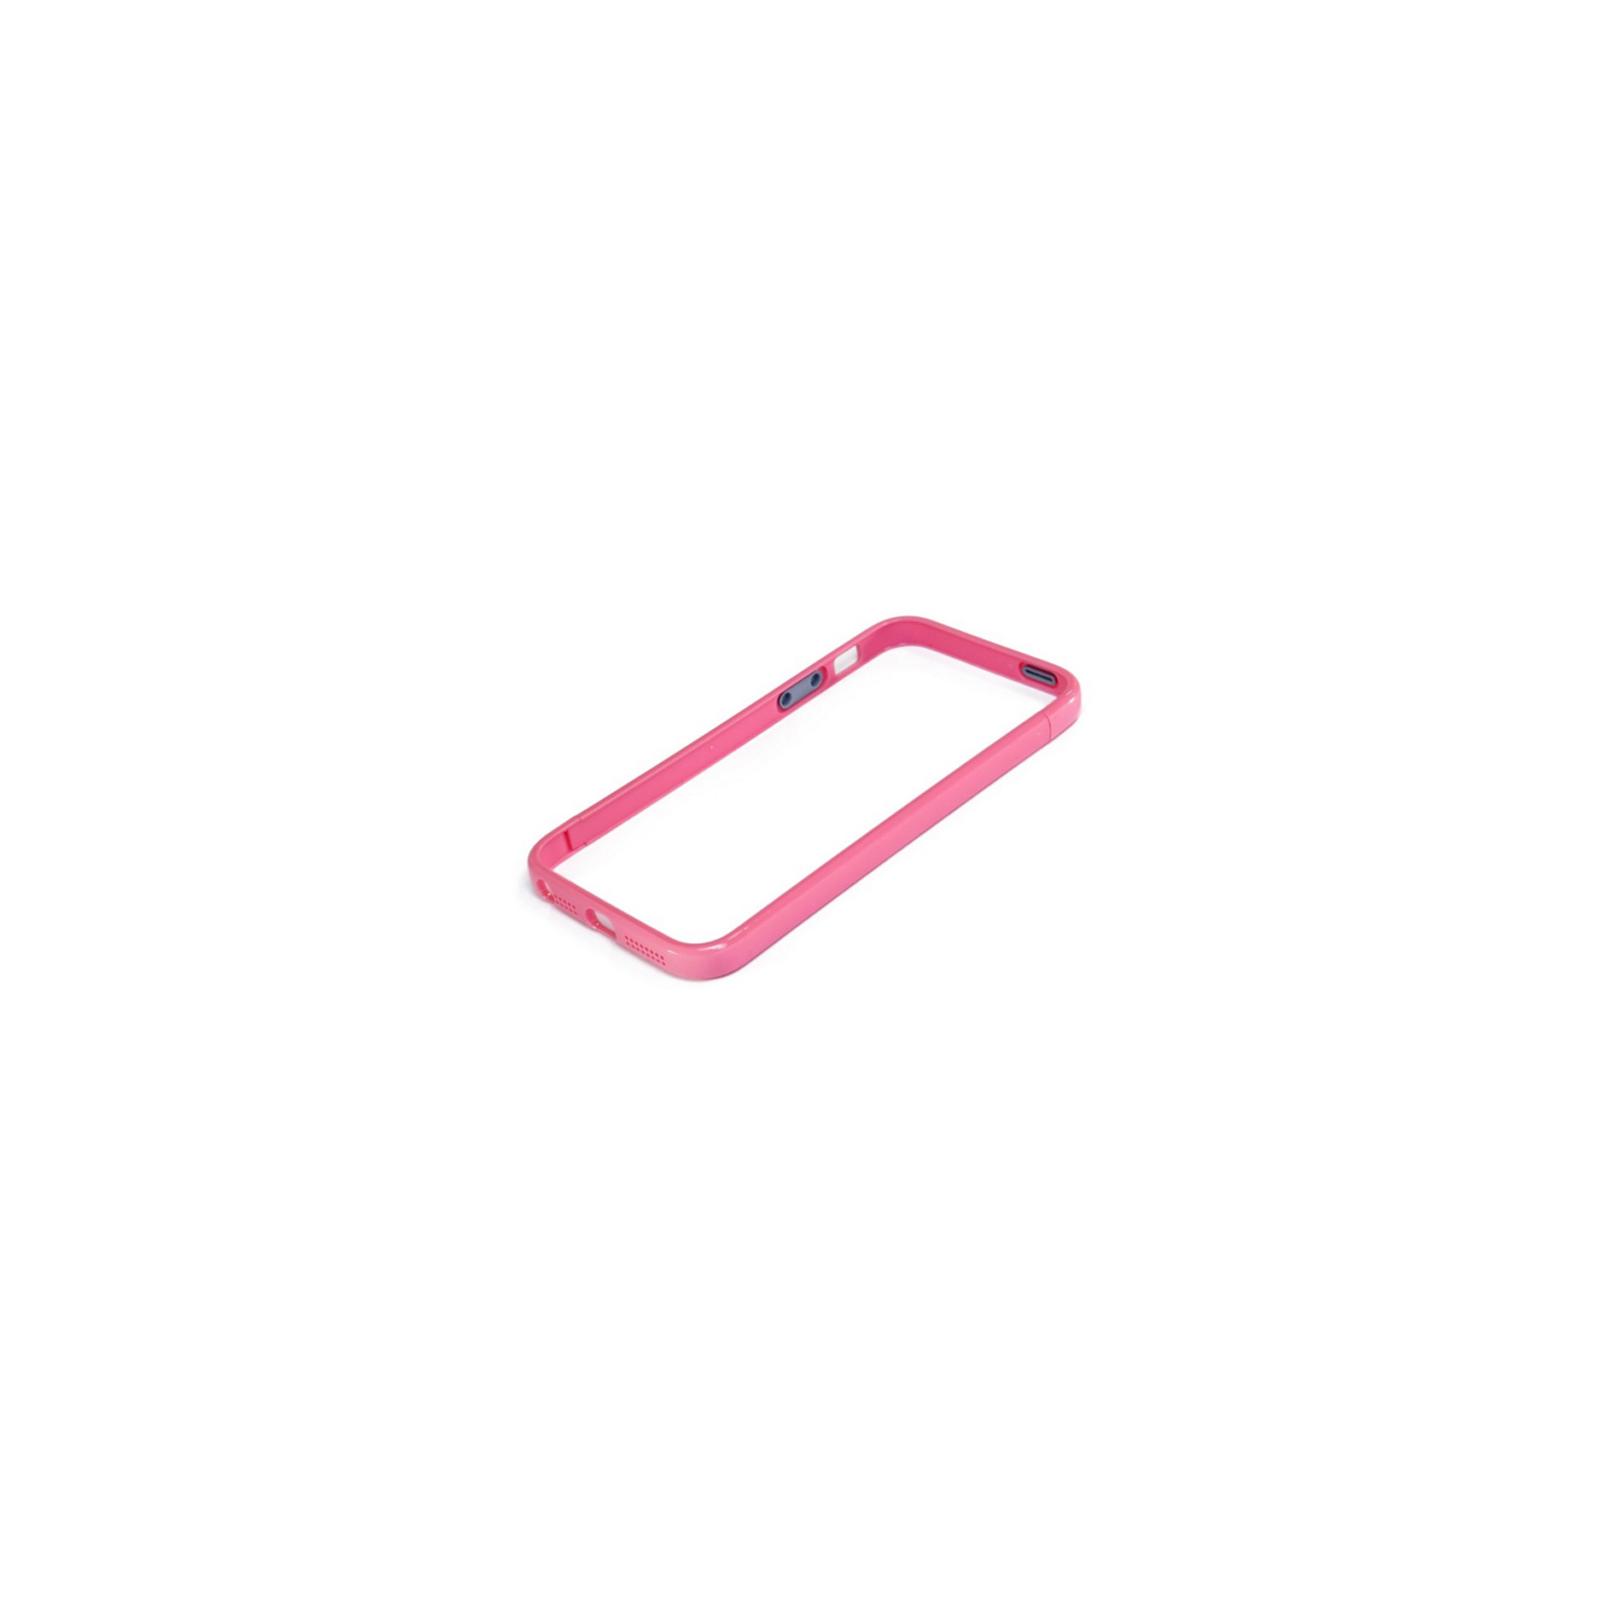 Чехол для моб. телефона JCPAL Colorful 3 in 1 для iPhone 5S/5 Set-Pink (JCP3219) изображение 2